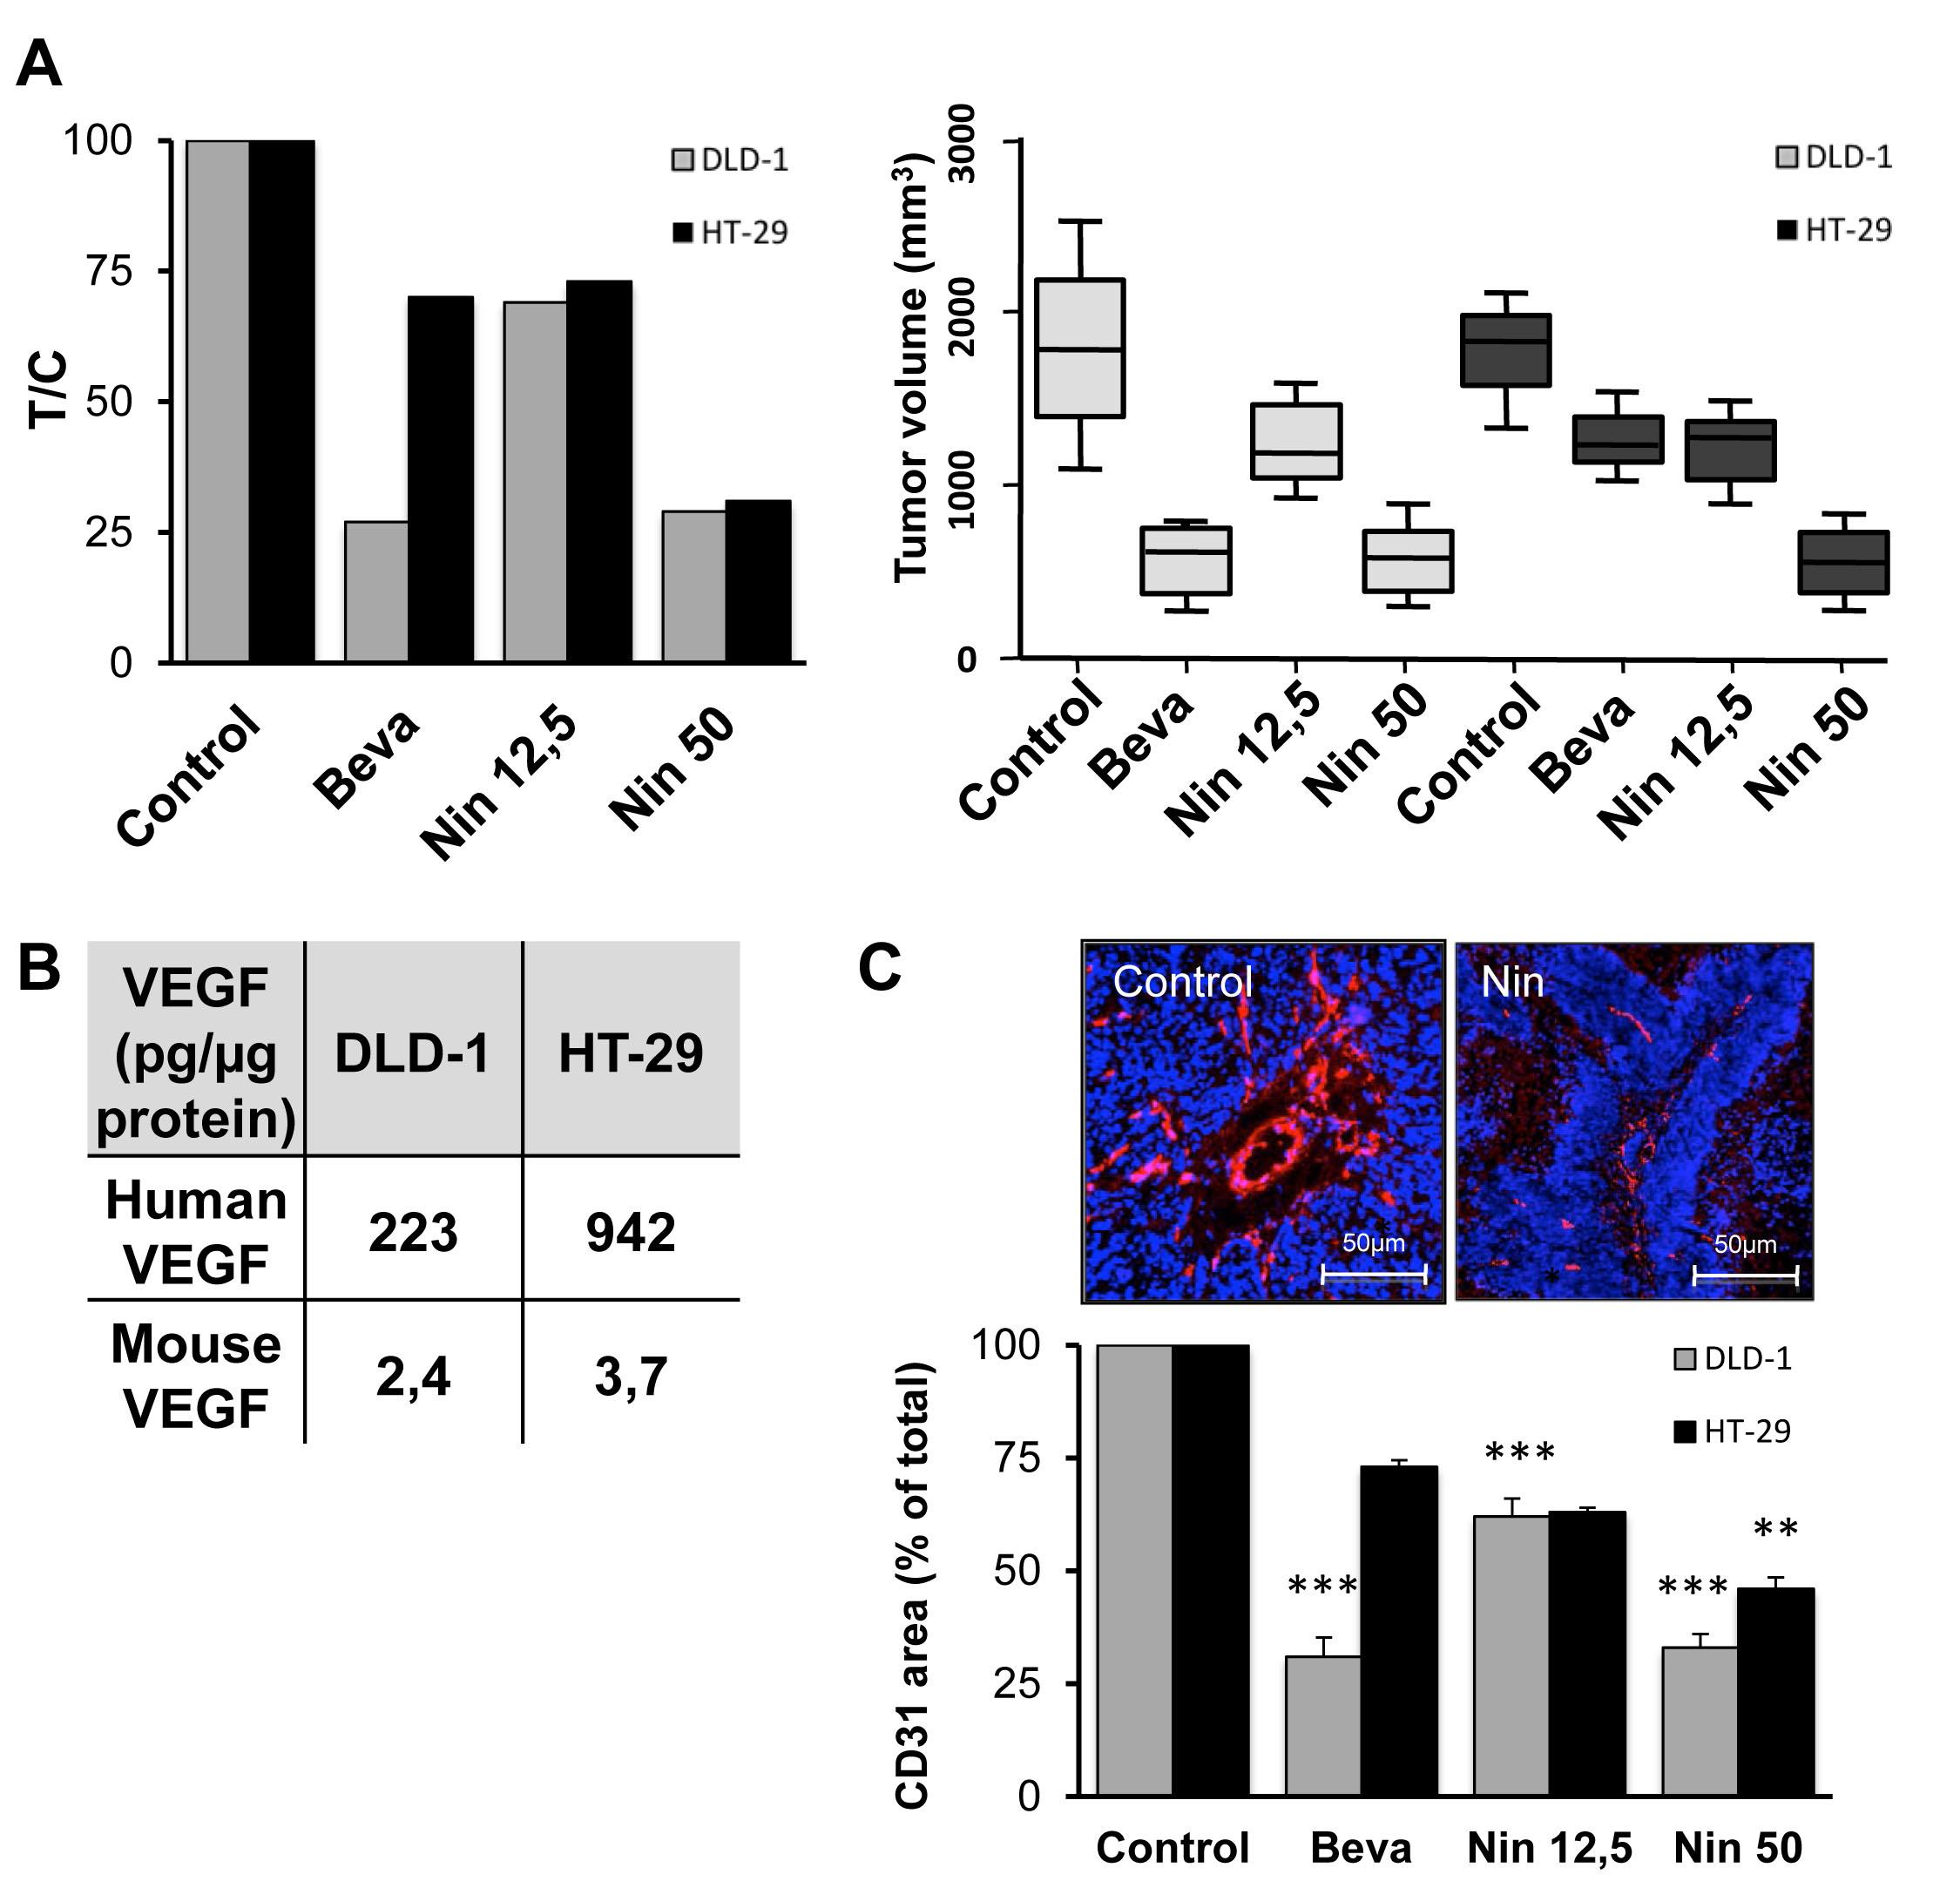 Influence of bevacizumab and nintedanib on tumor growth and angiogenesis in CRC xenografts.